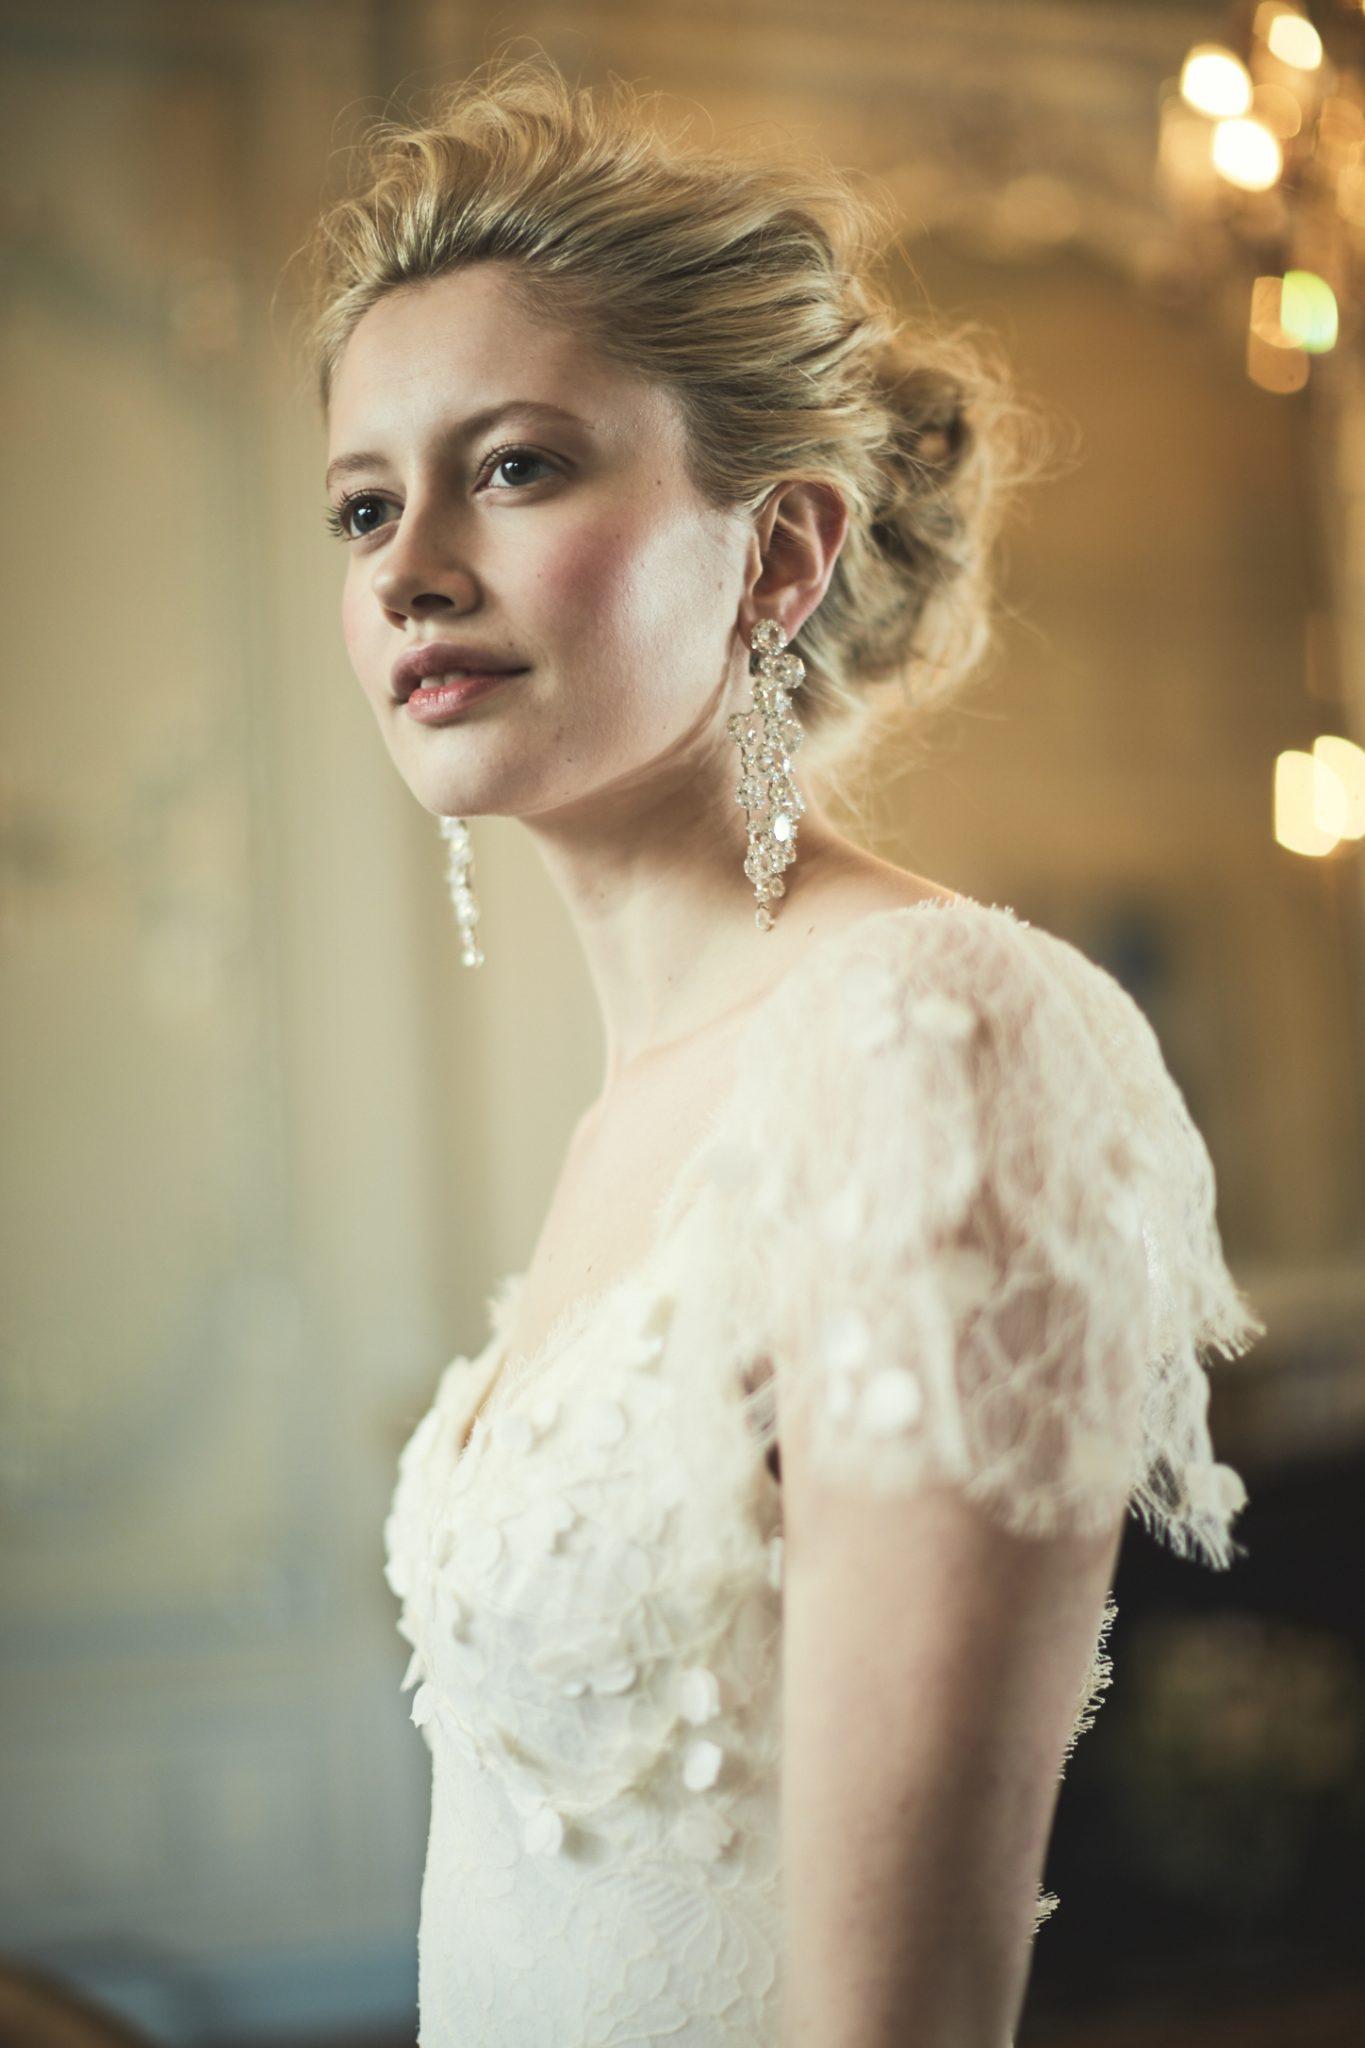 Phillipa Lepley 3D Floral petal embrodiery on lace wedding dress